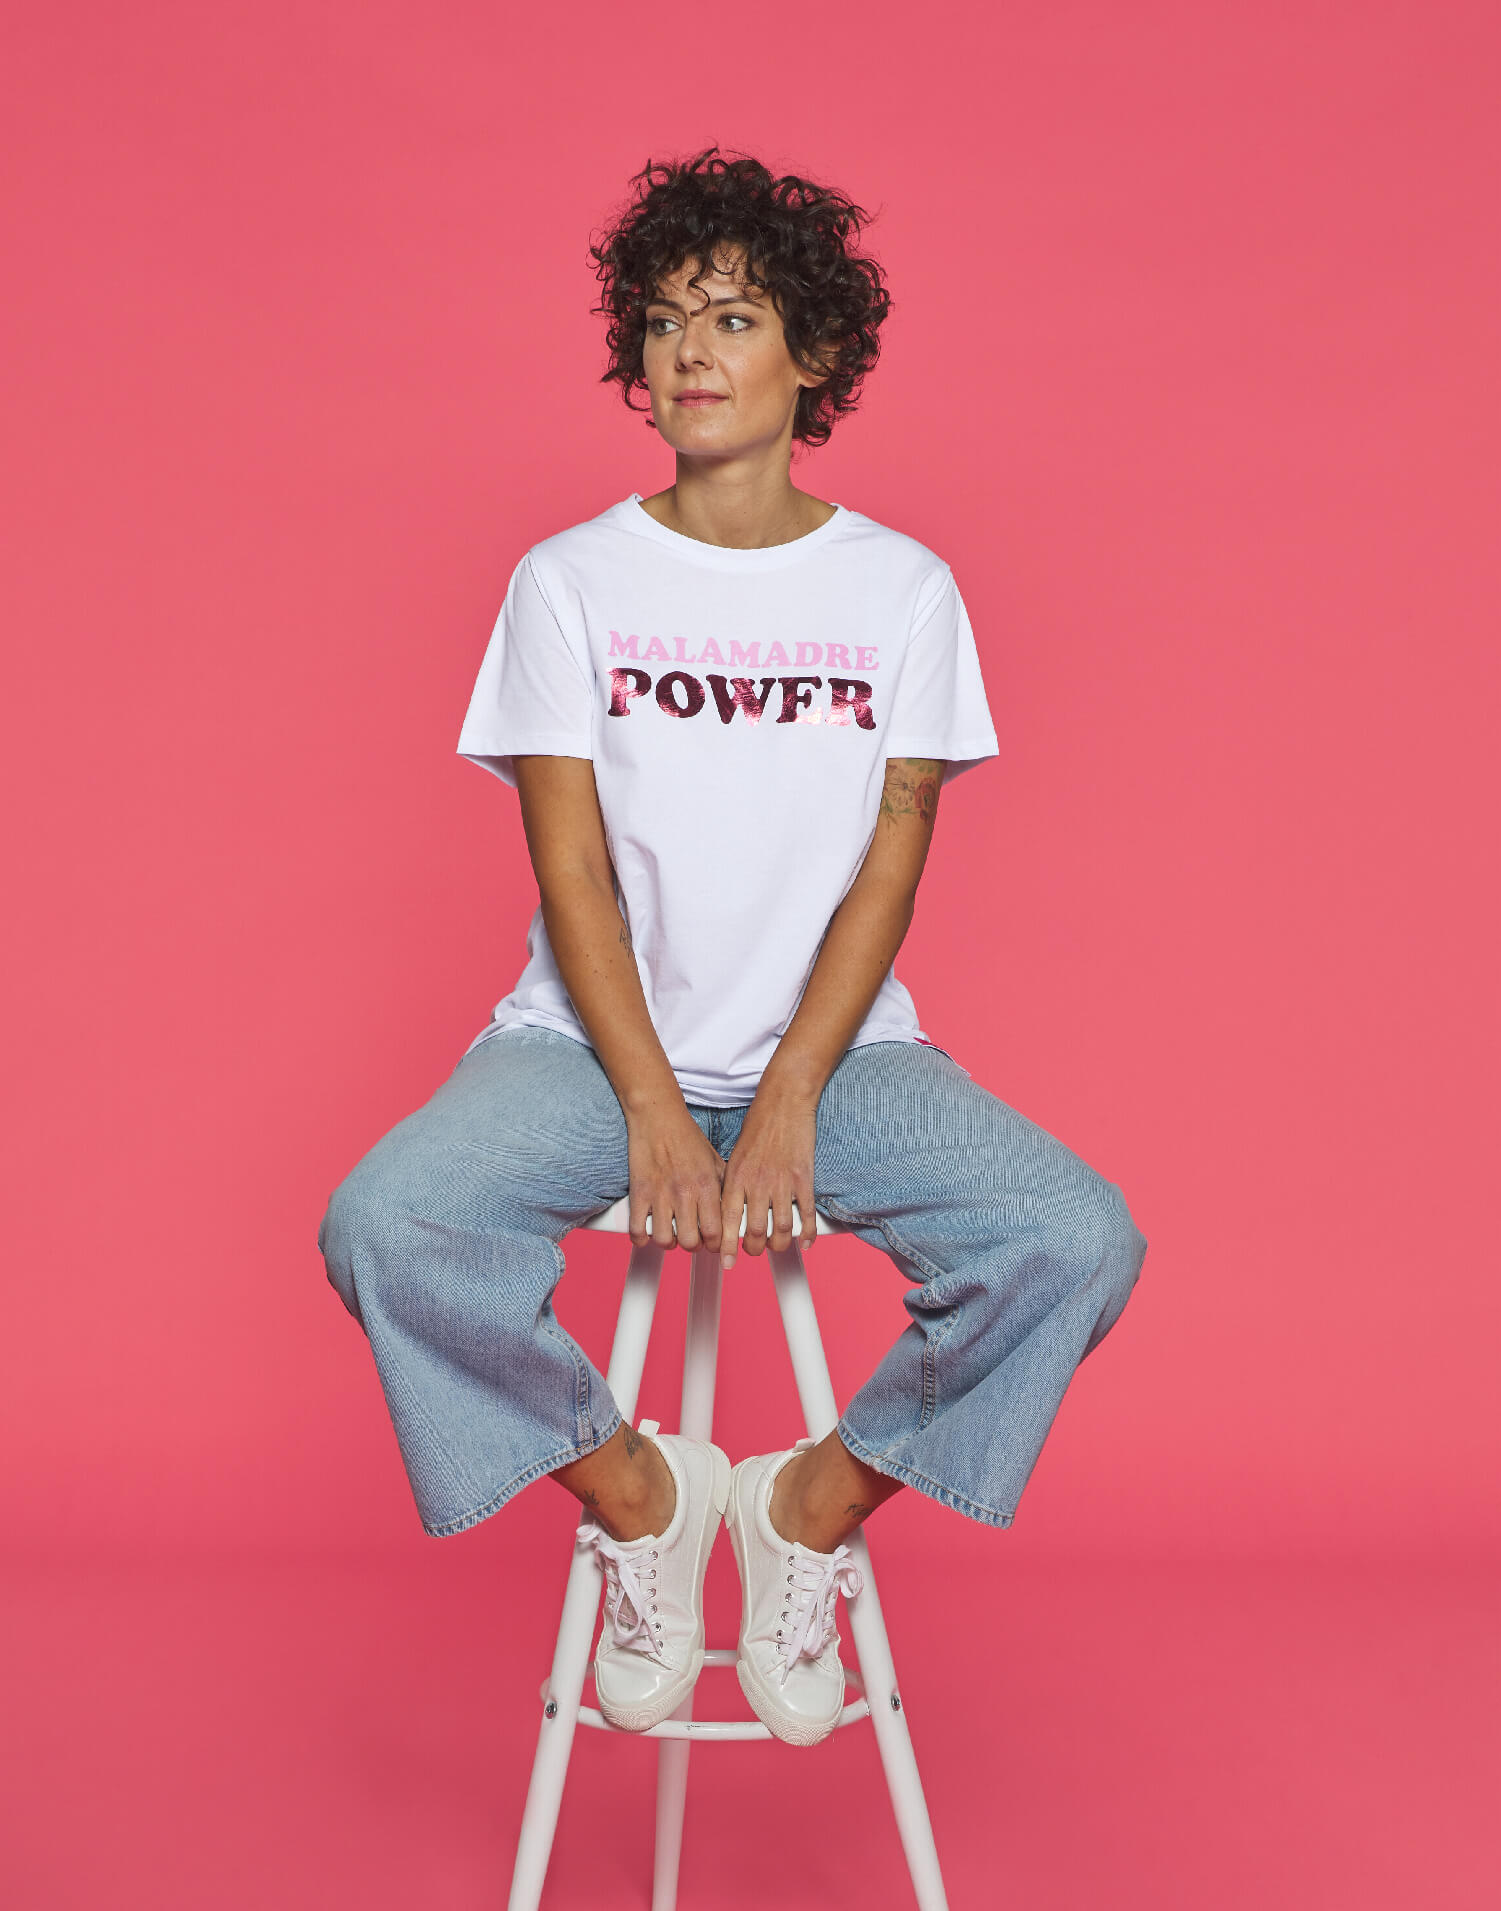 Camiseta blanca solidaria Malamadre Power